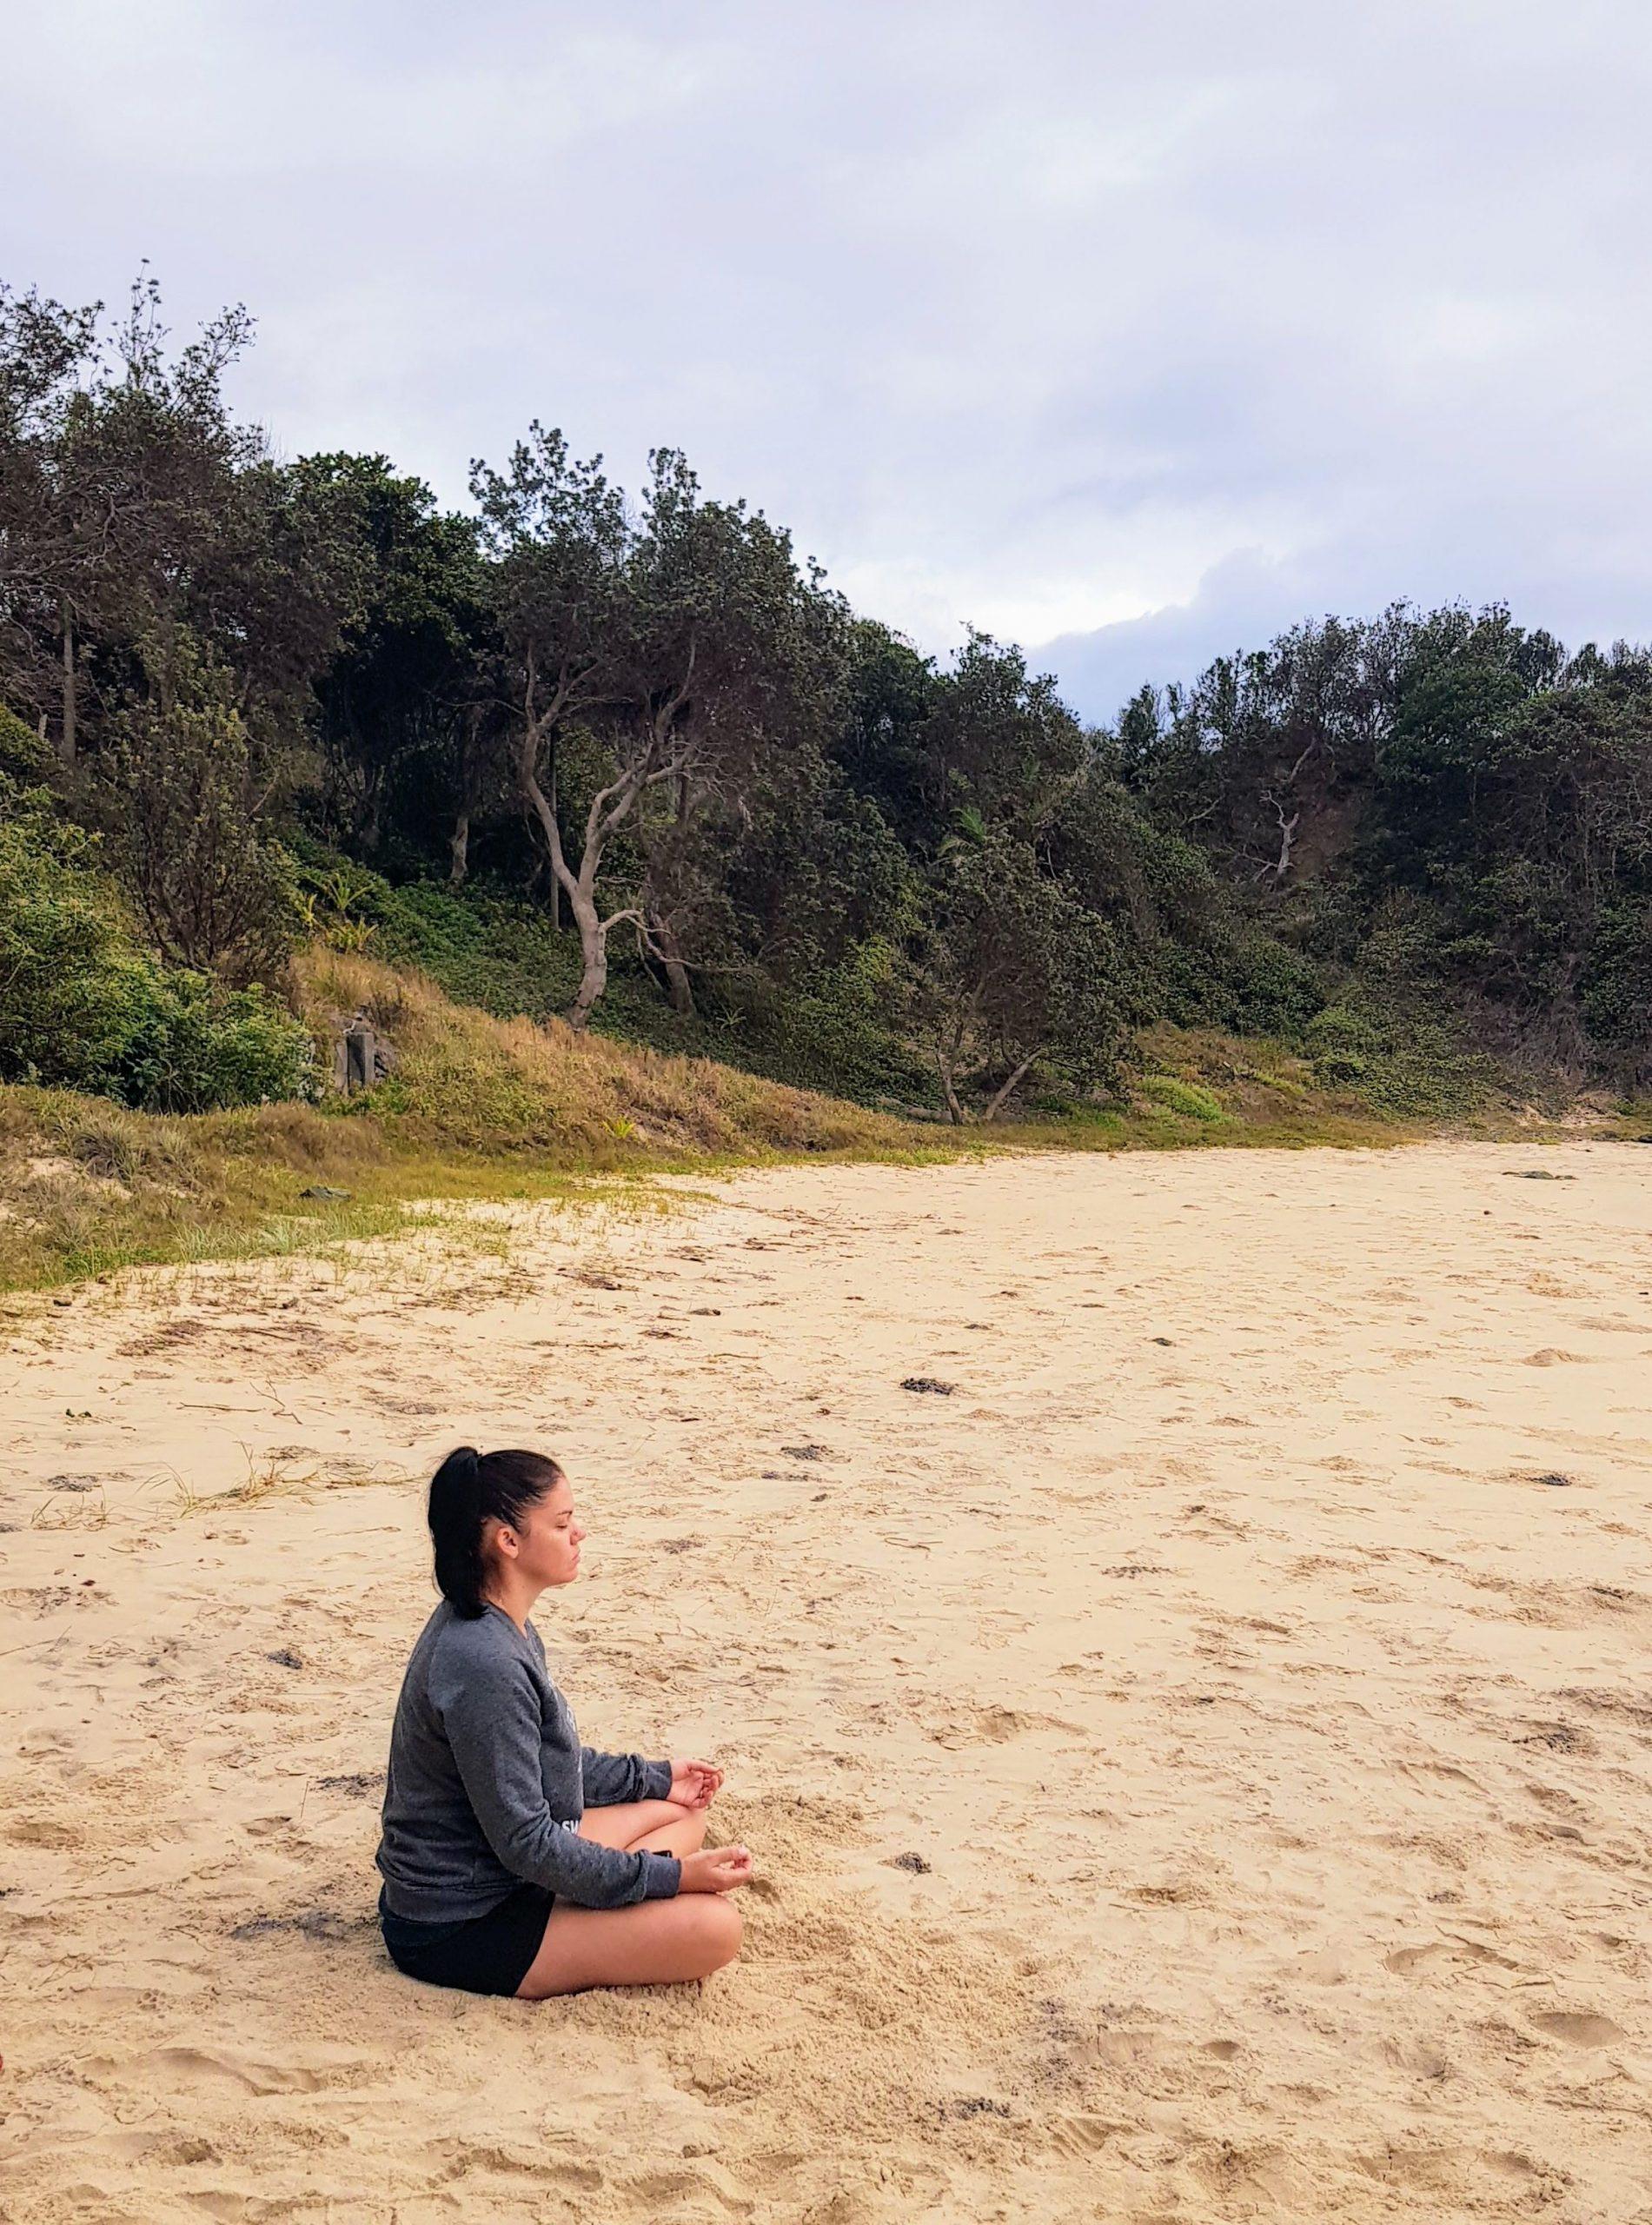 abundant life advice psychic meditation why visualisation beach nature samantha waters